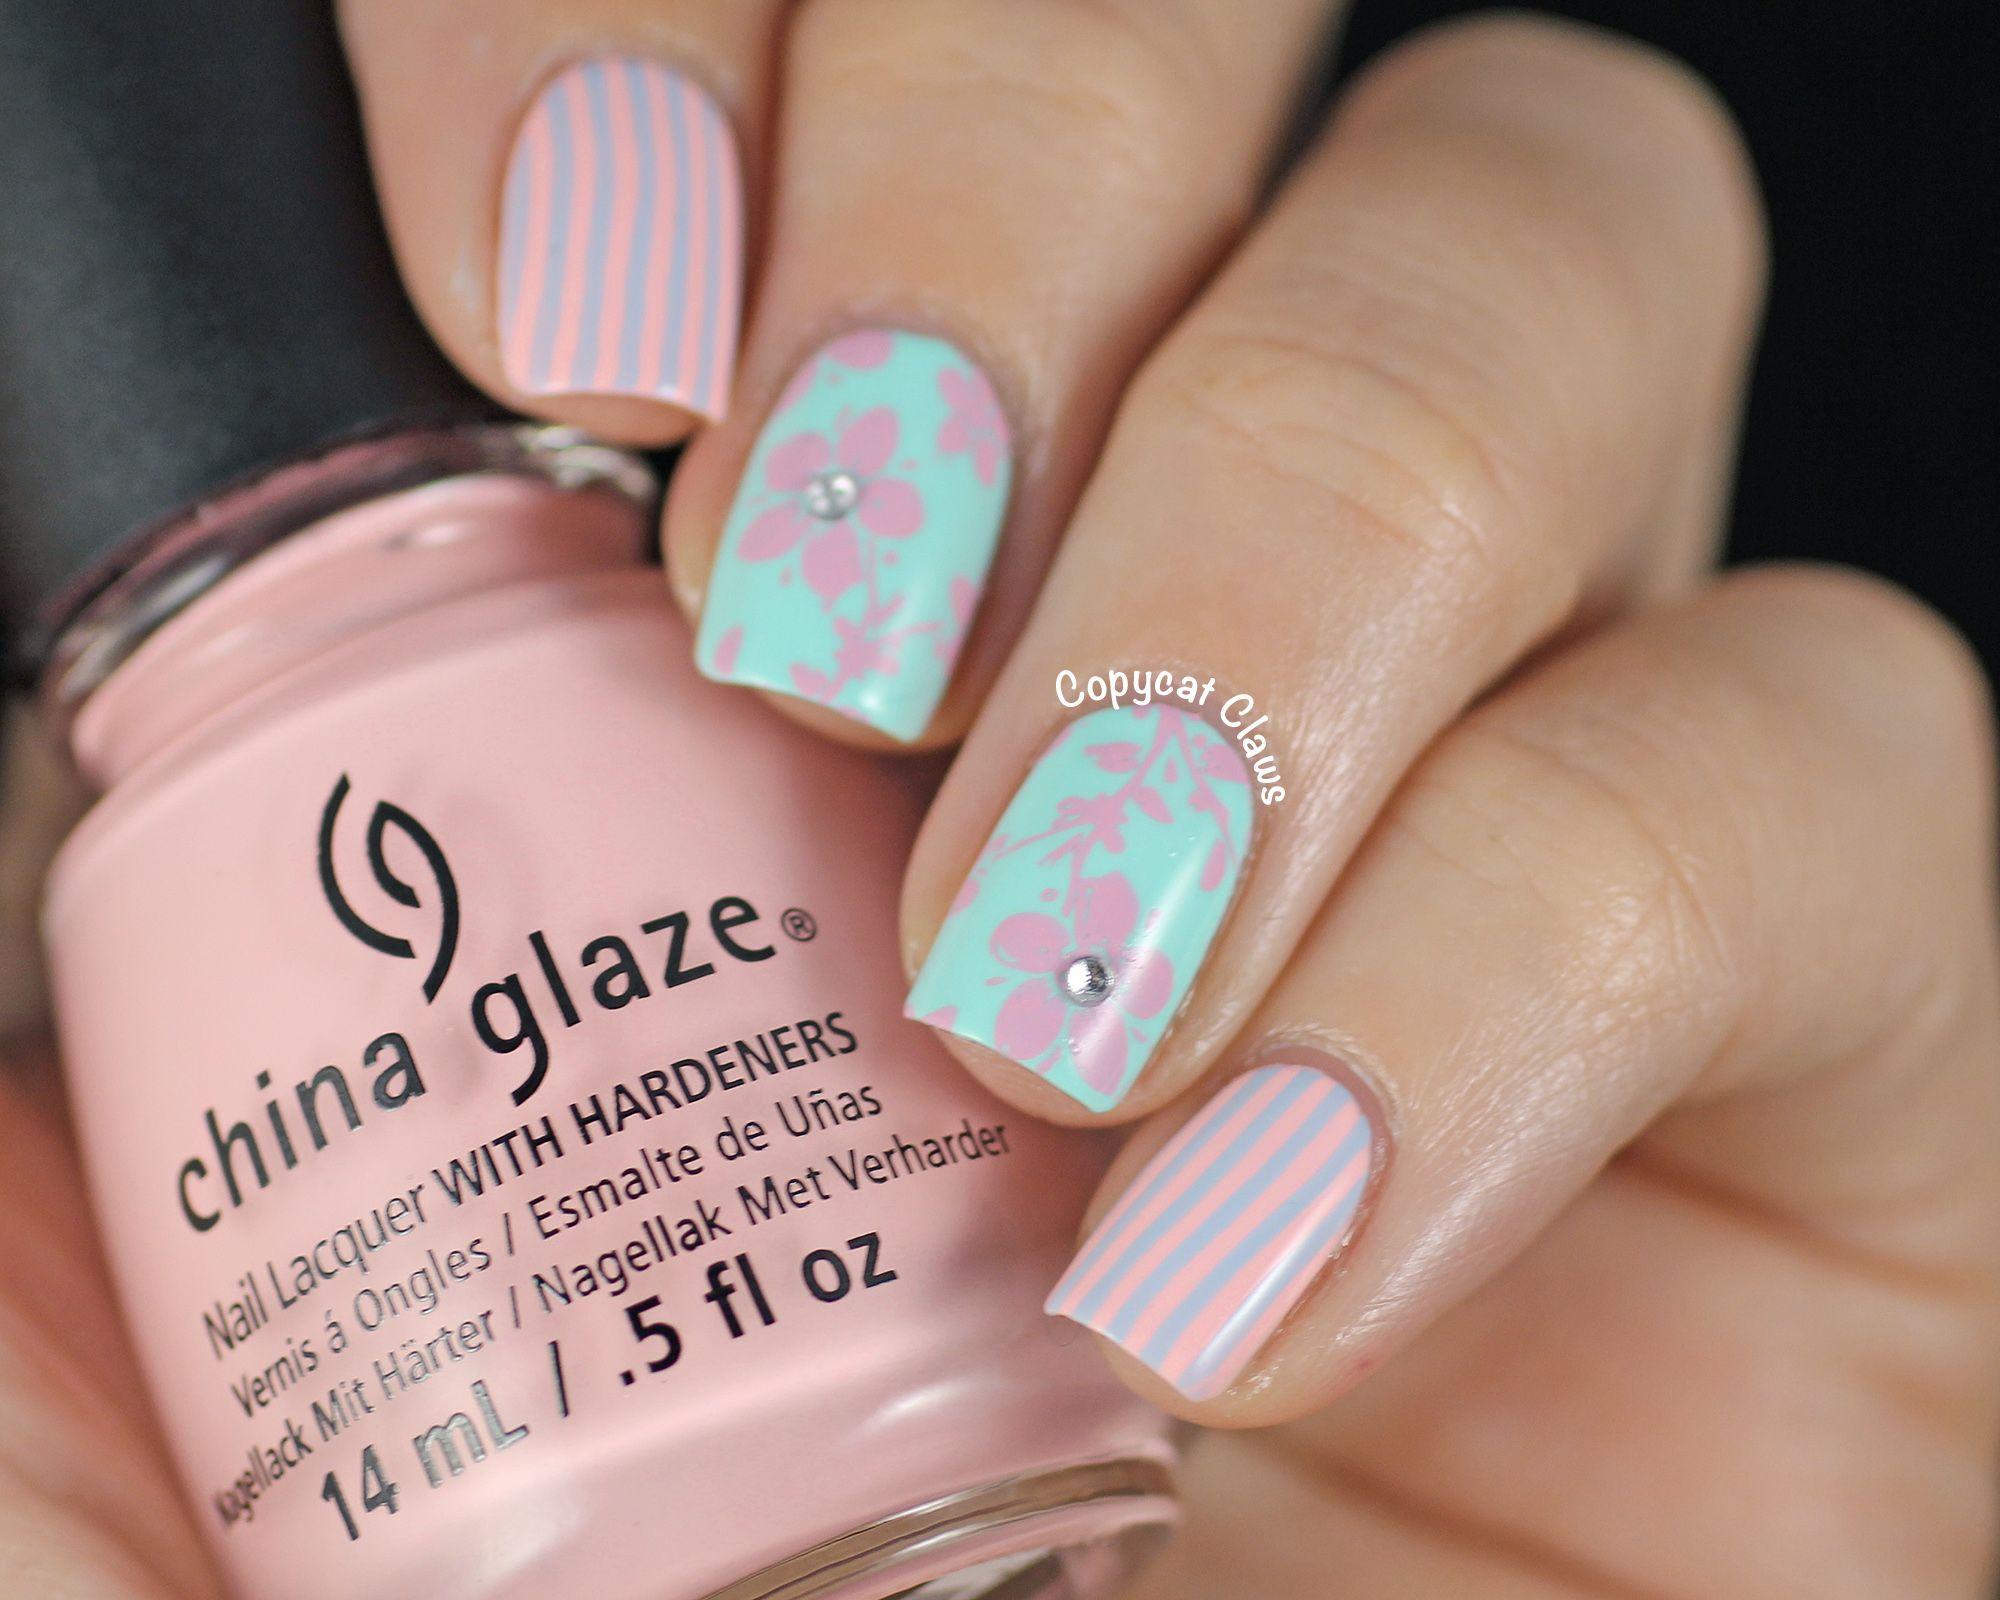 Flowers Nail Art Nude And Mint Nails Nail Design China Glaze